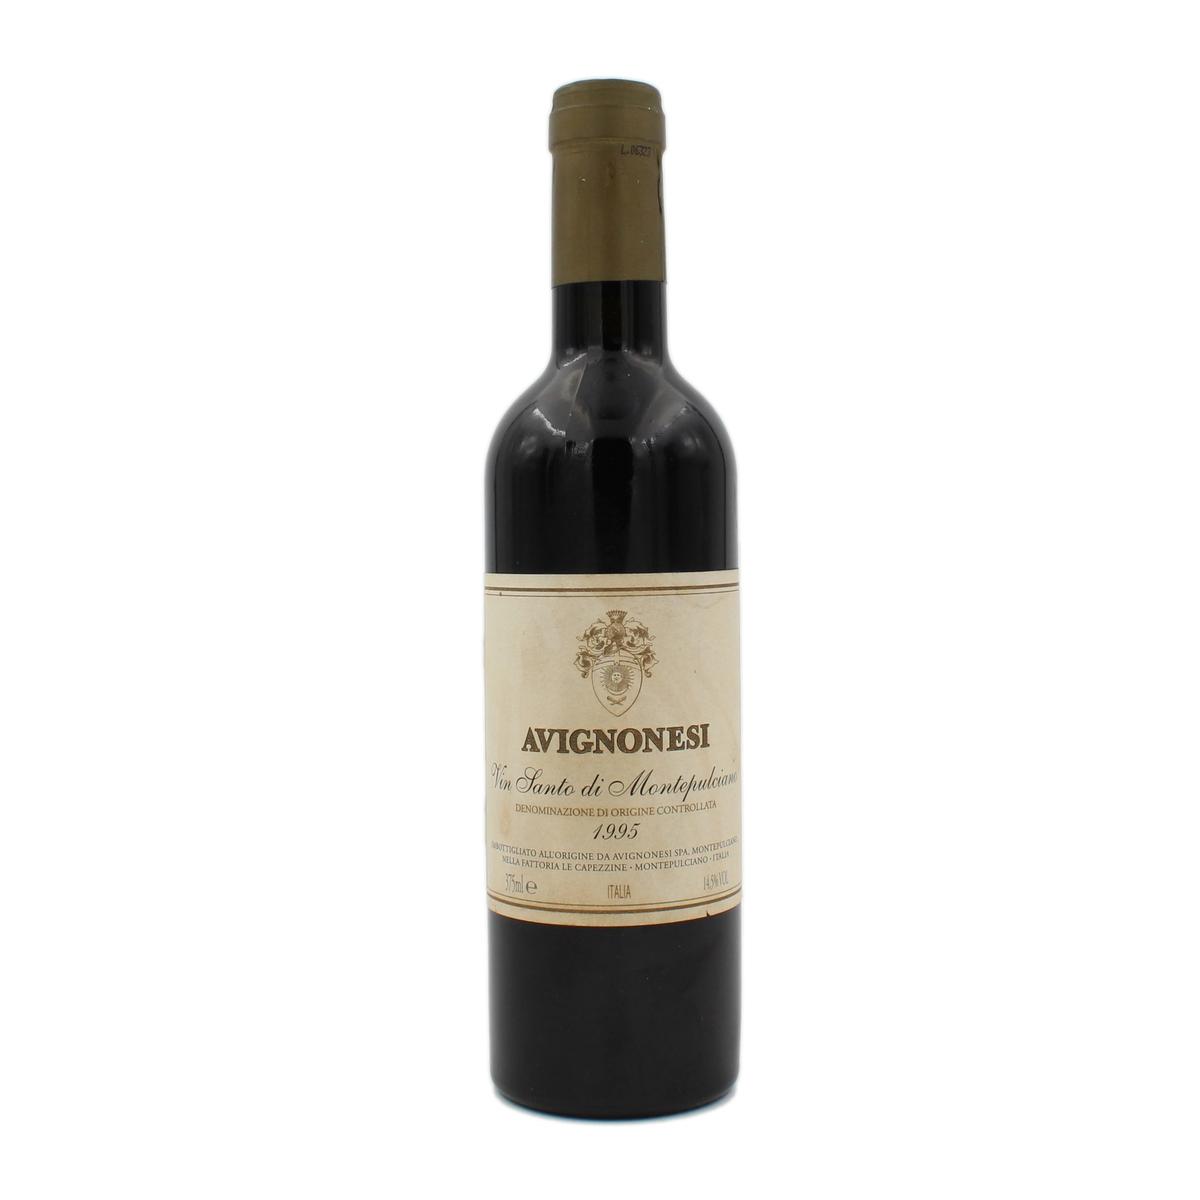 Vin Santo di Montepulciano 1995 Avignonesi